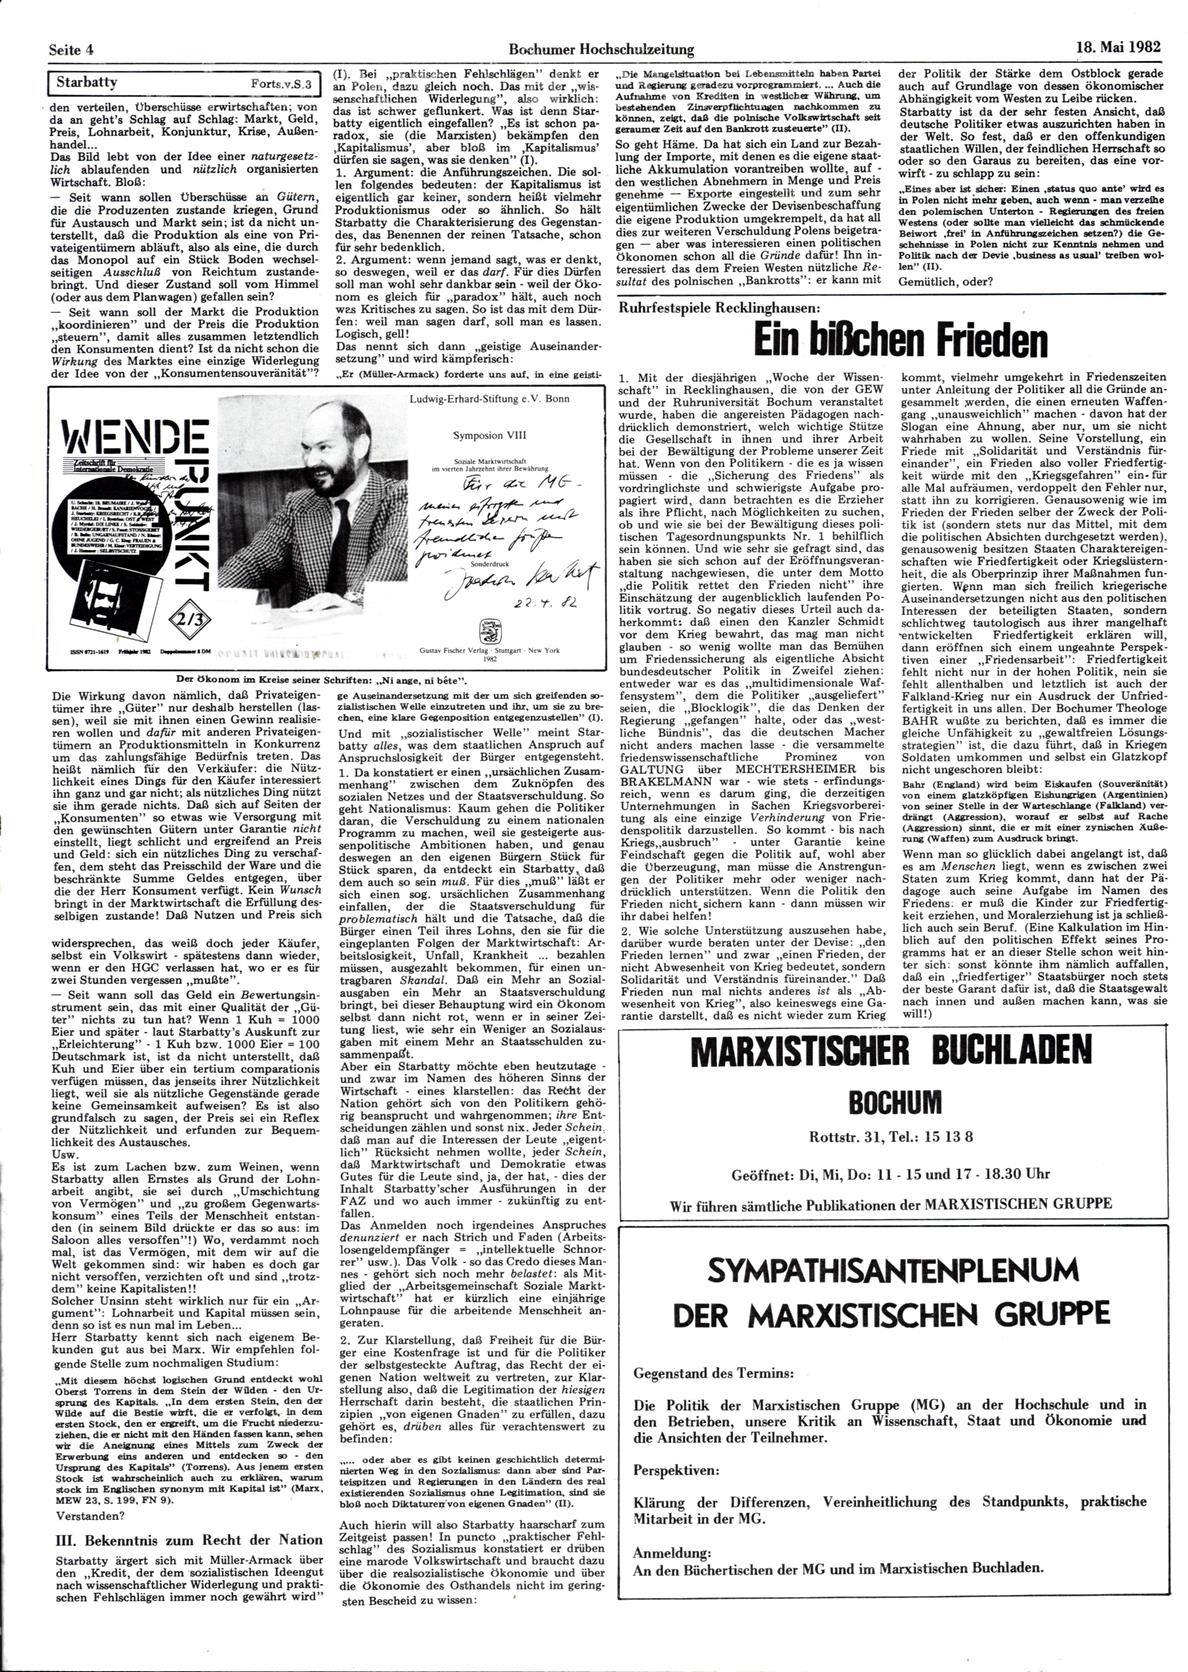 Bochum_BHZ_19820518_051_004